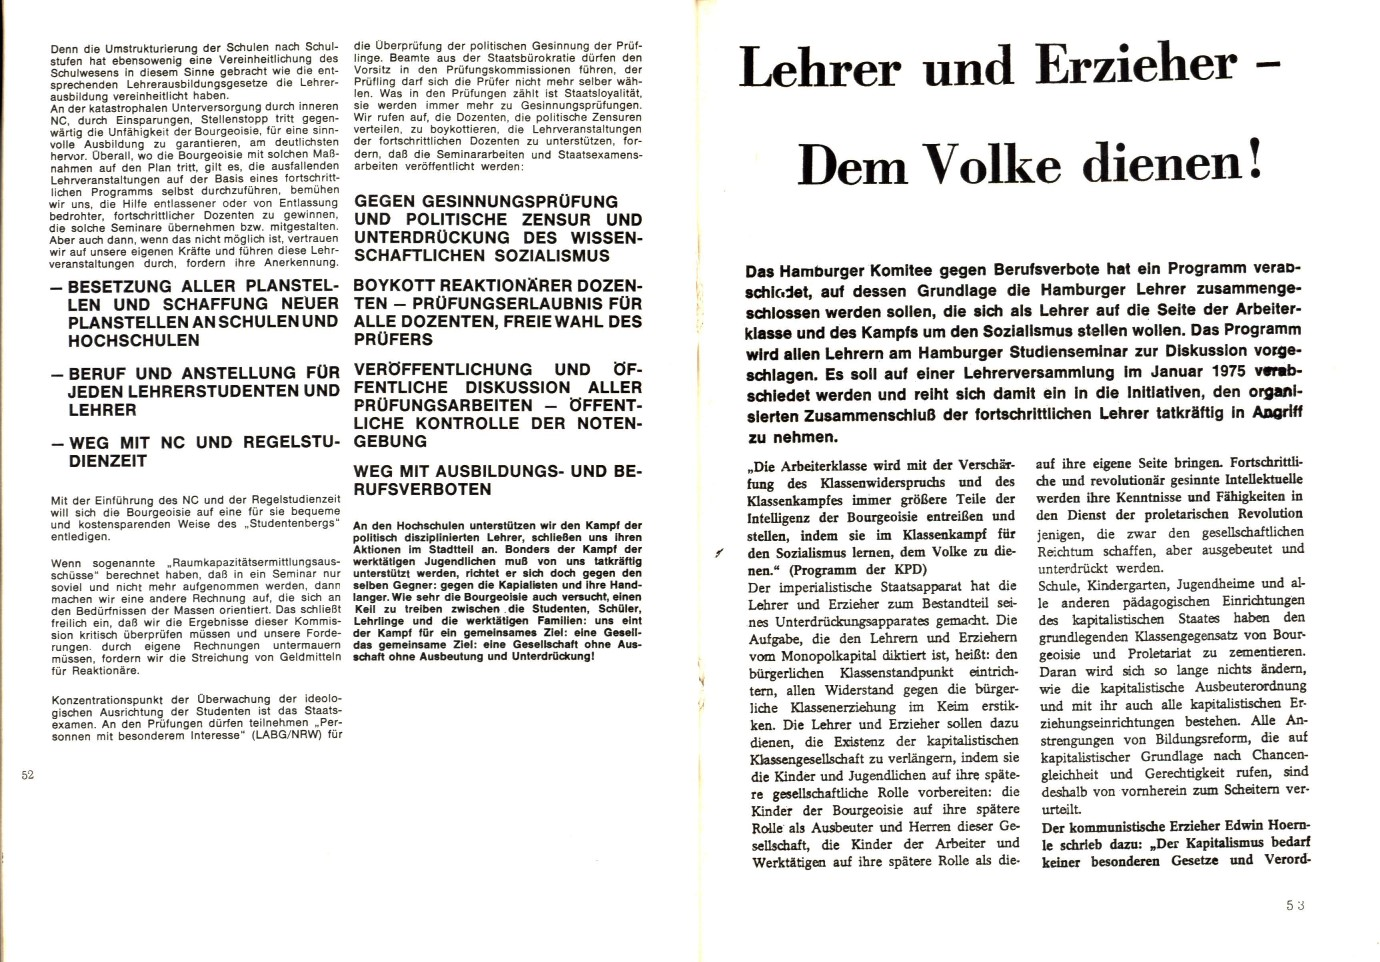 KSV_1975_Lehrerausbildung_27